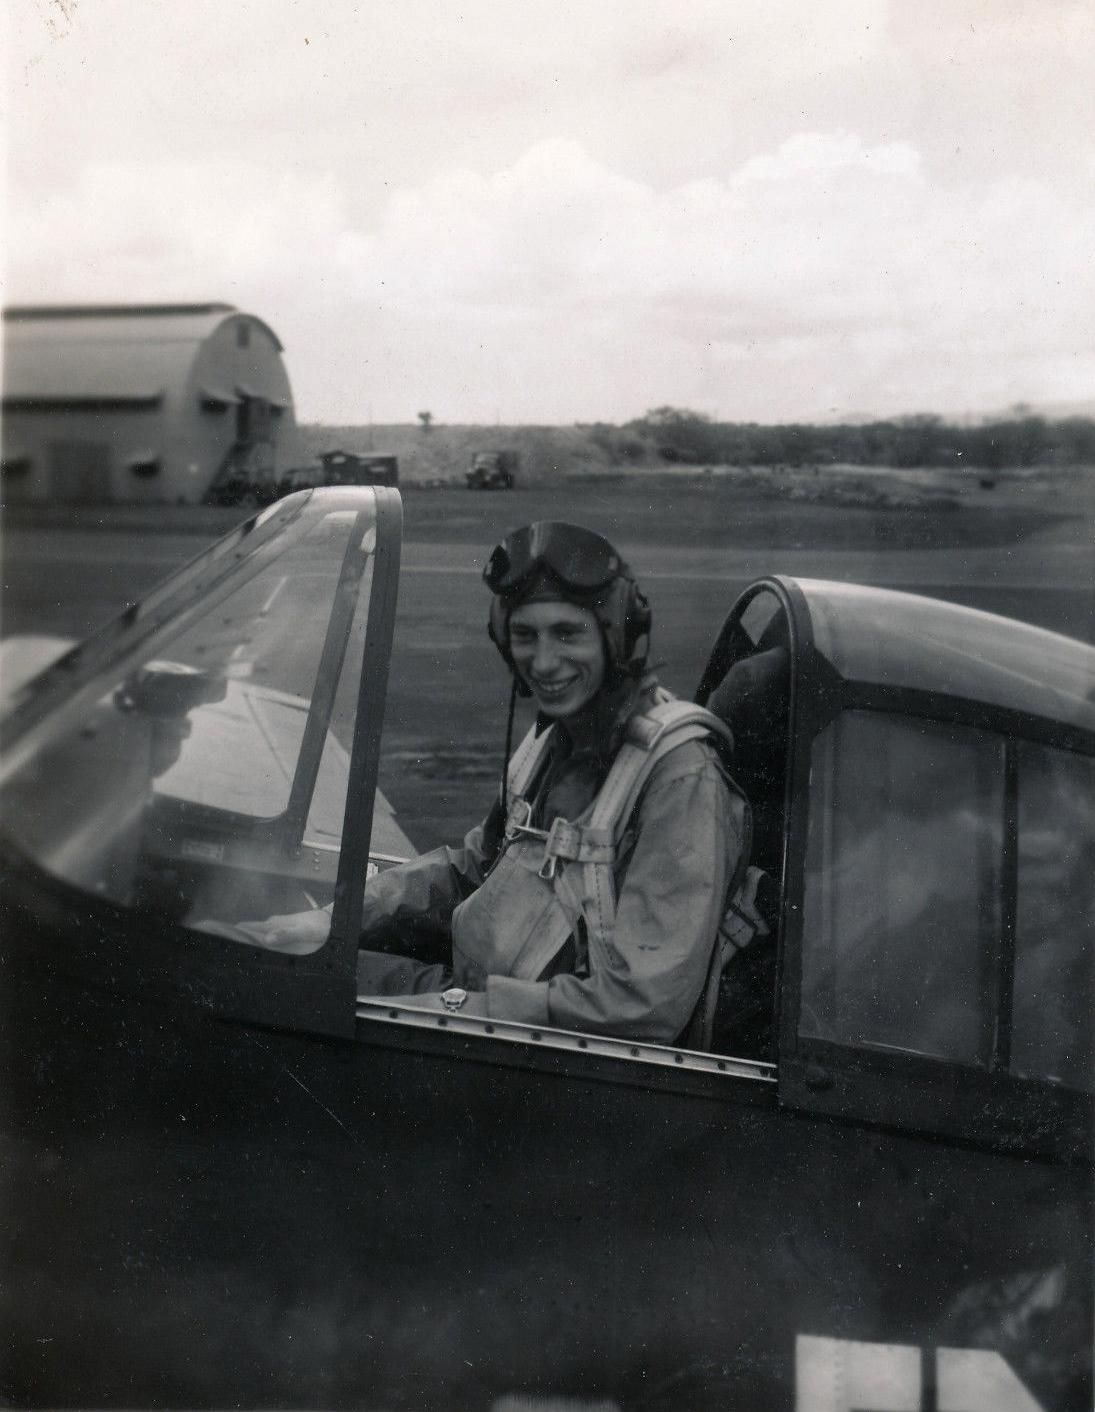 Aircrew USN VBF 8 Ens Austerman NAS Puunene 1945 01